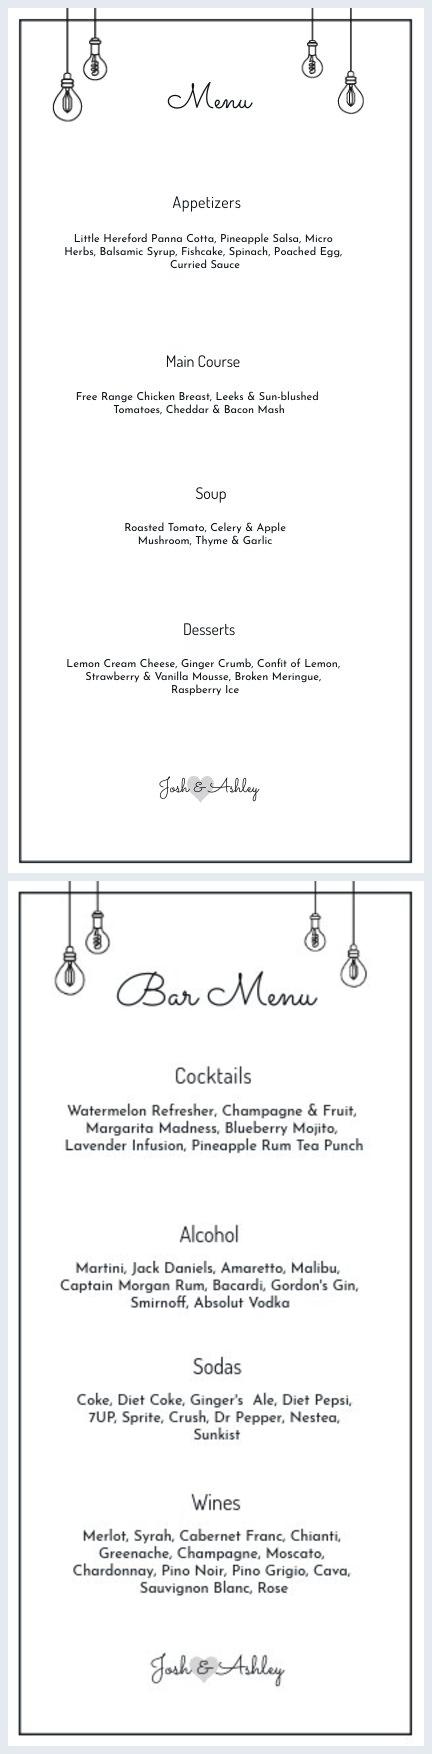 mod u00e8le de carte et menu de restaurant imprimable